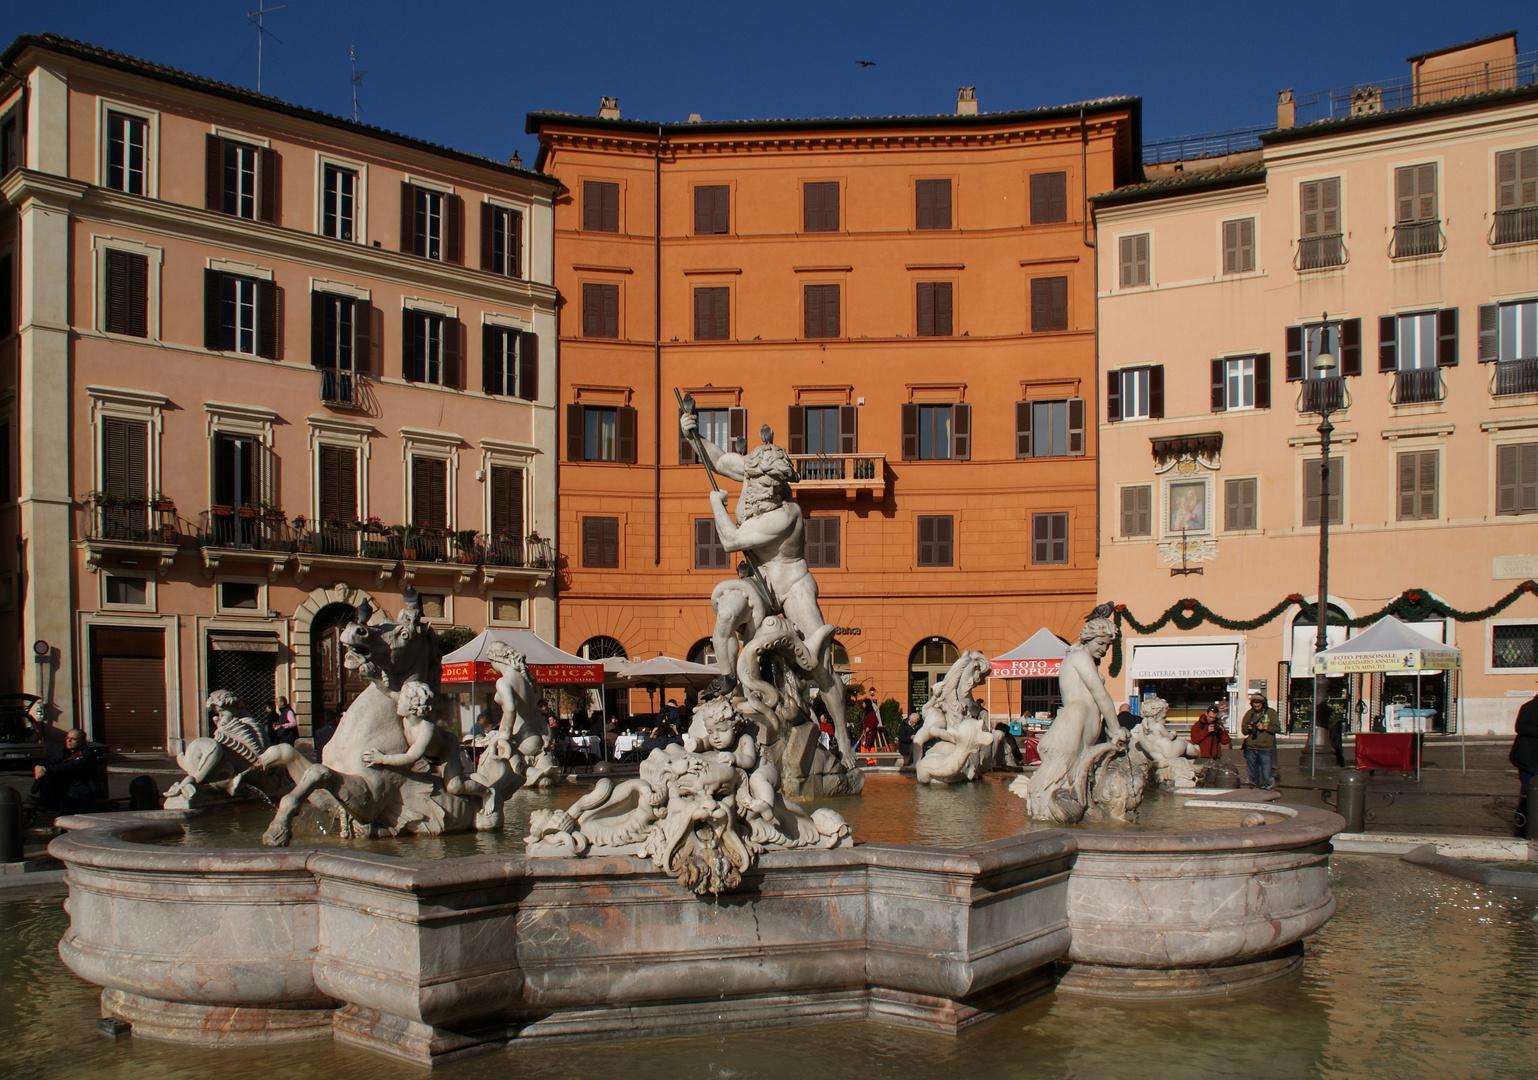 Weihnachten in Rom (1) - Azzurro Foto & Bild   europe, italy ...